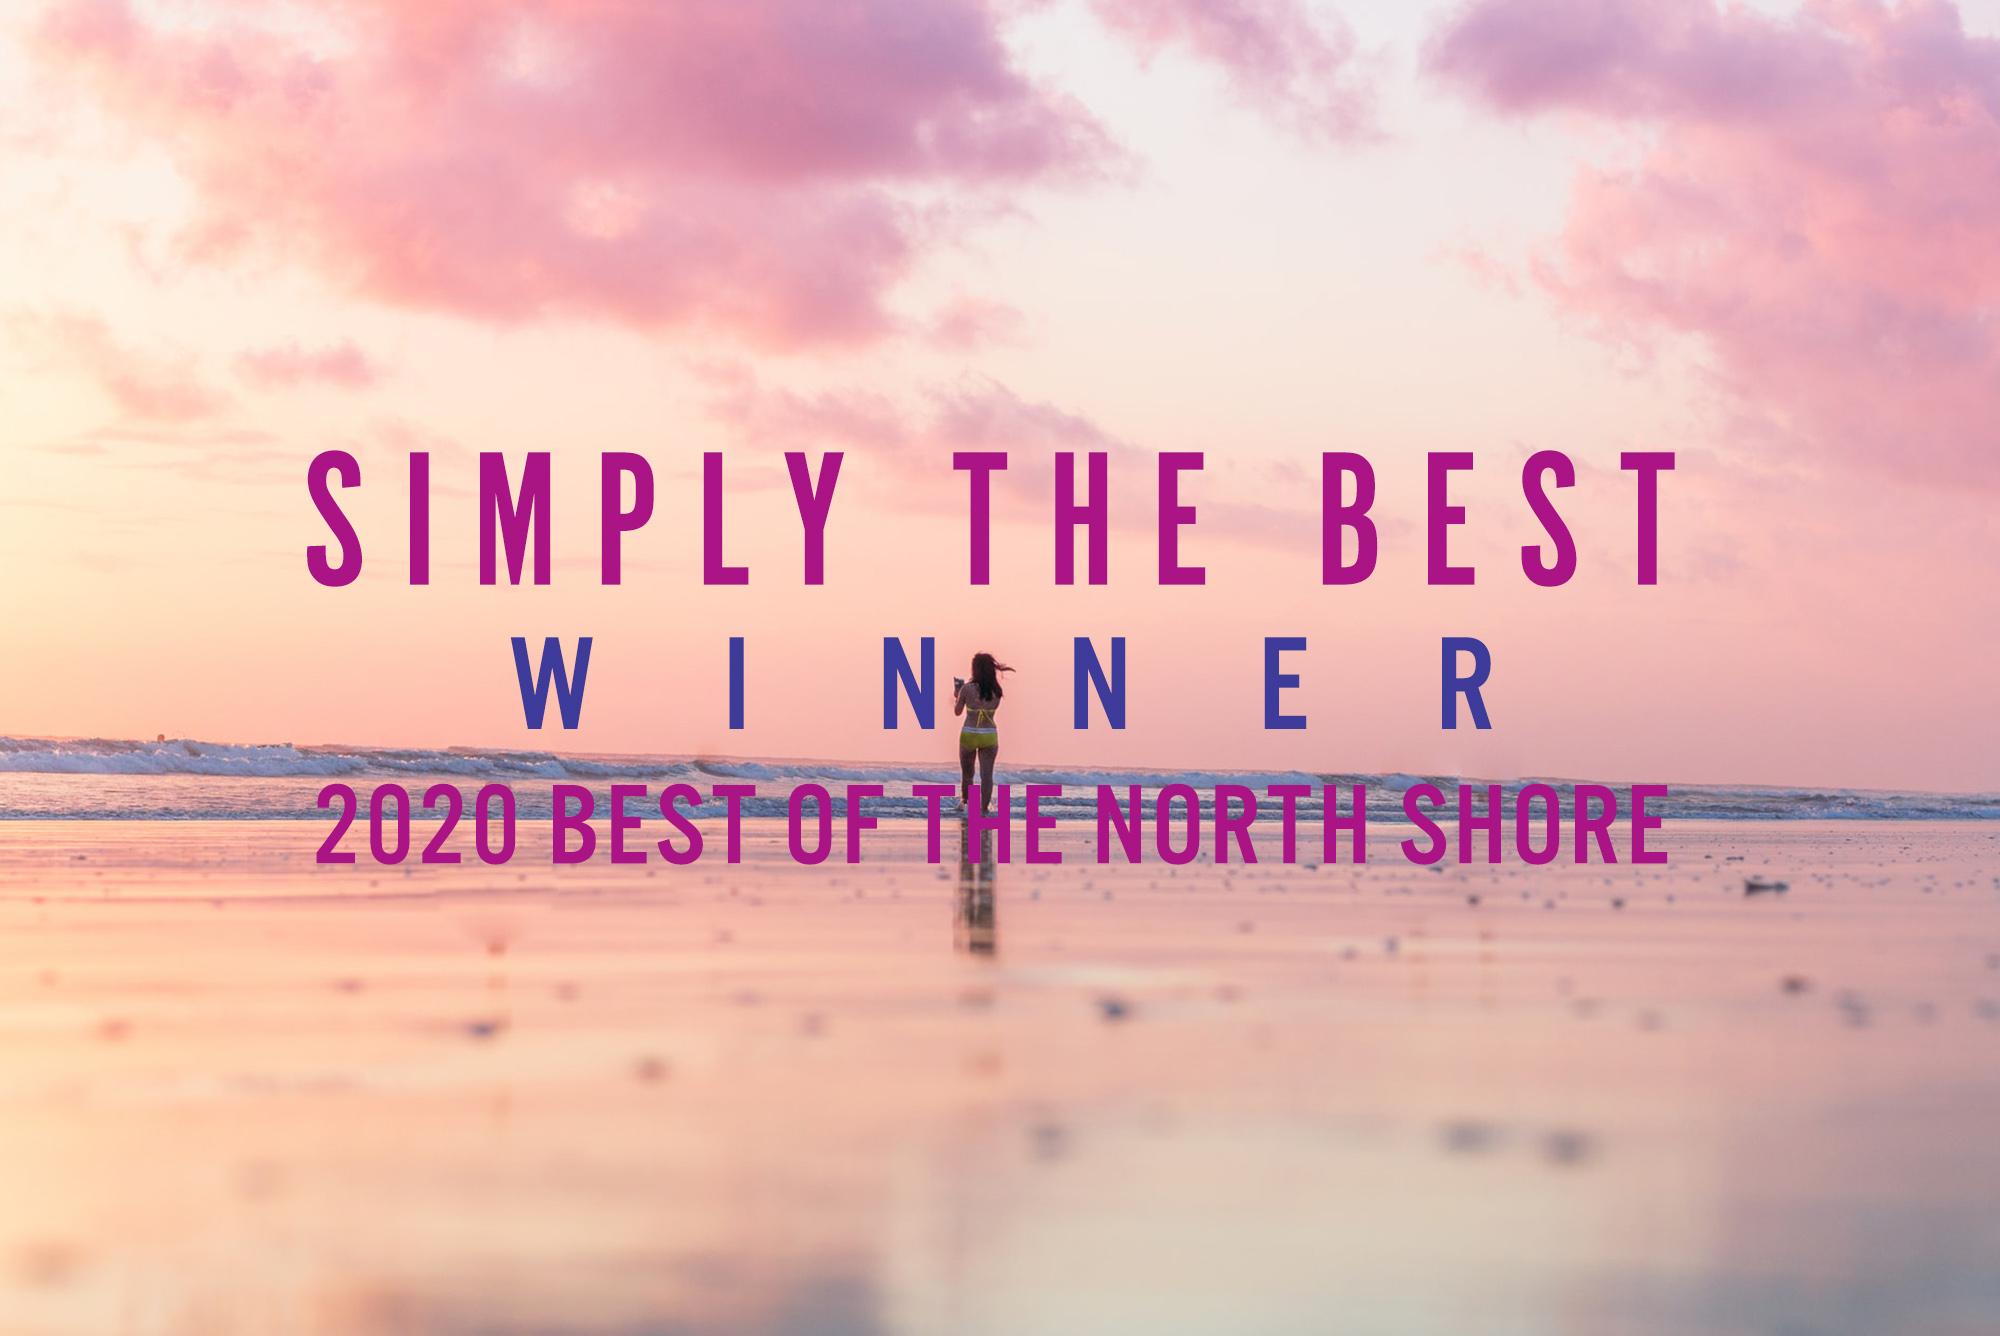 Winner: 2020 Best of the North Shore